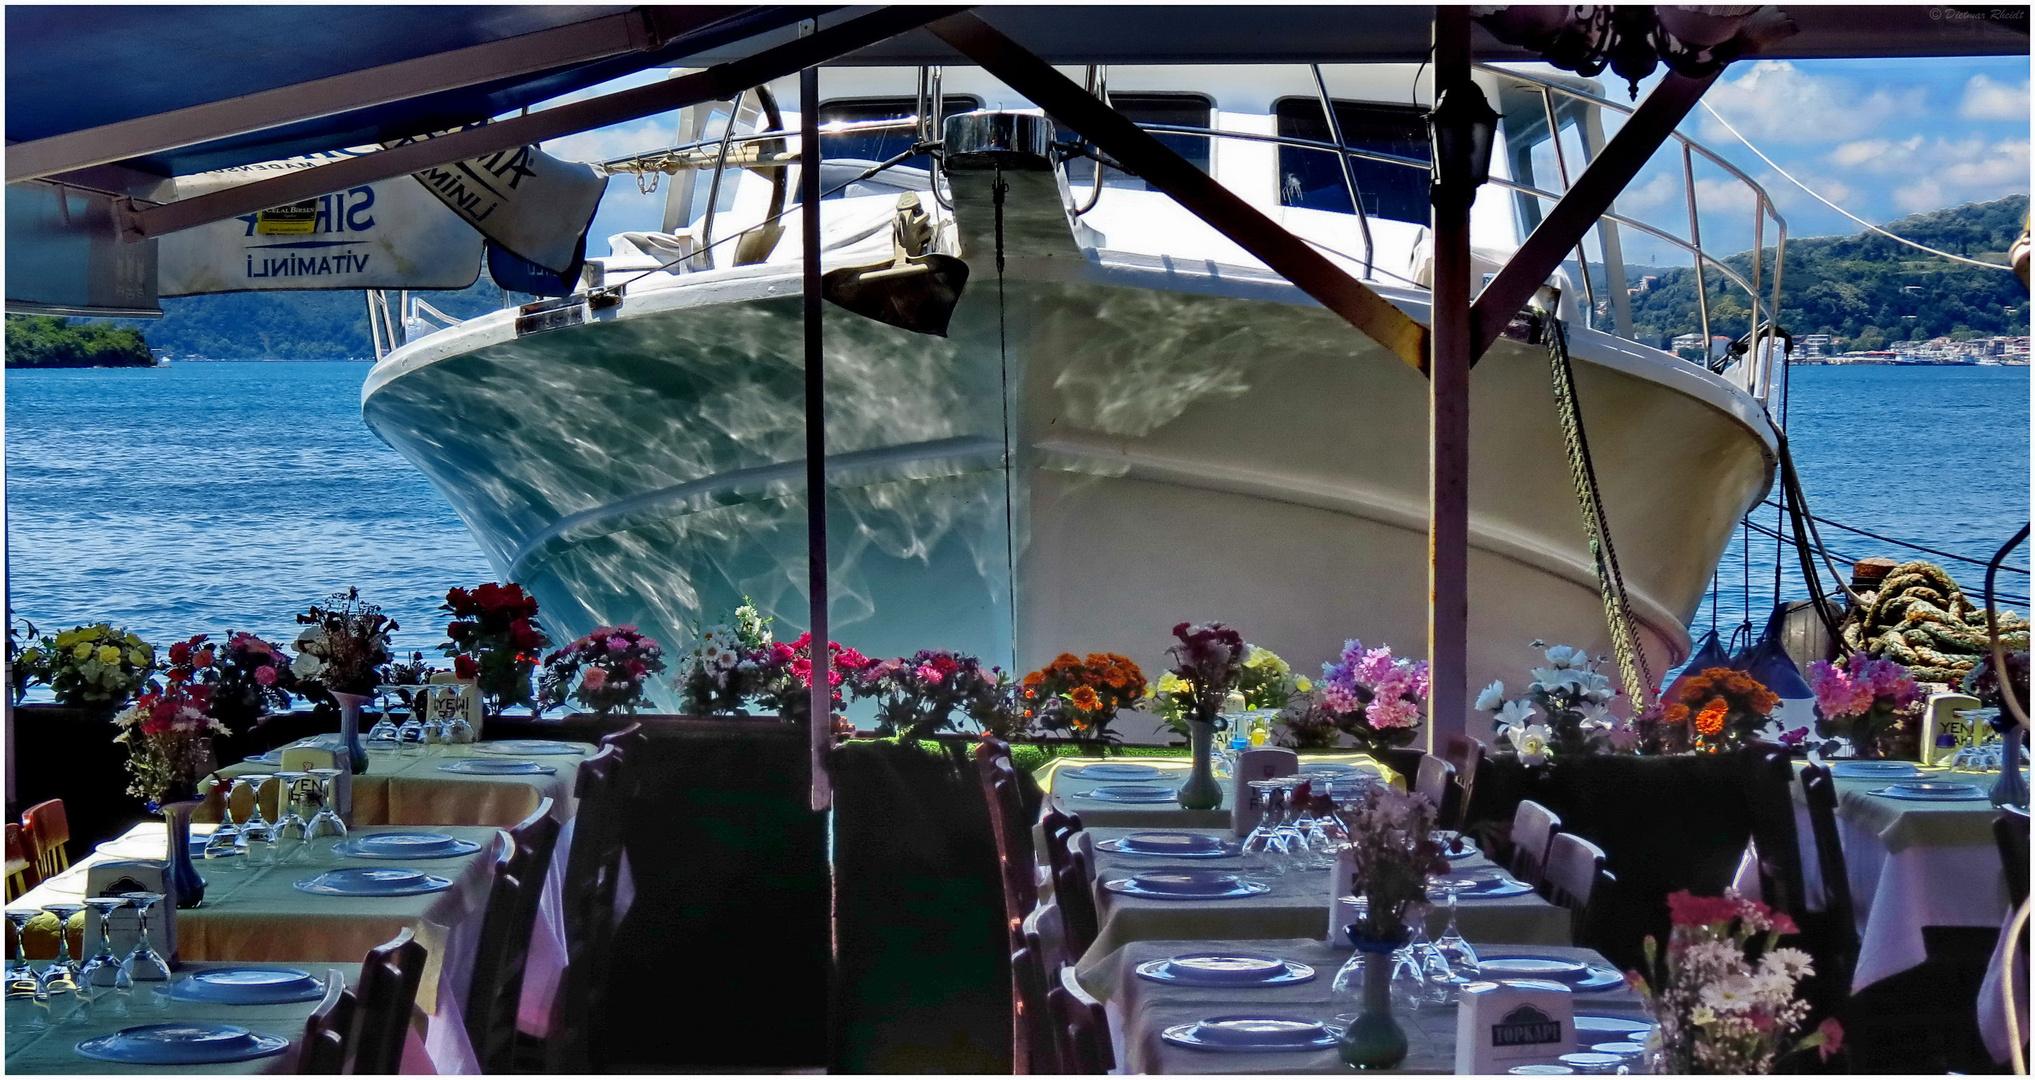 Meeresfrüchte in Anadolu Kavagi